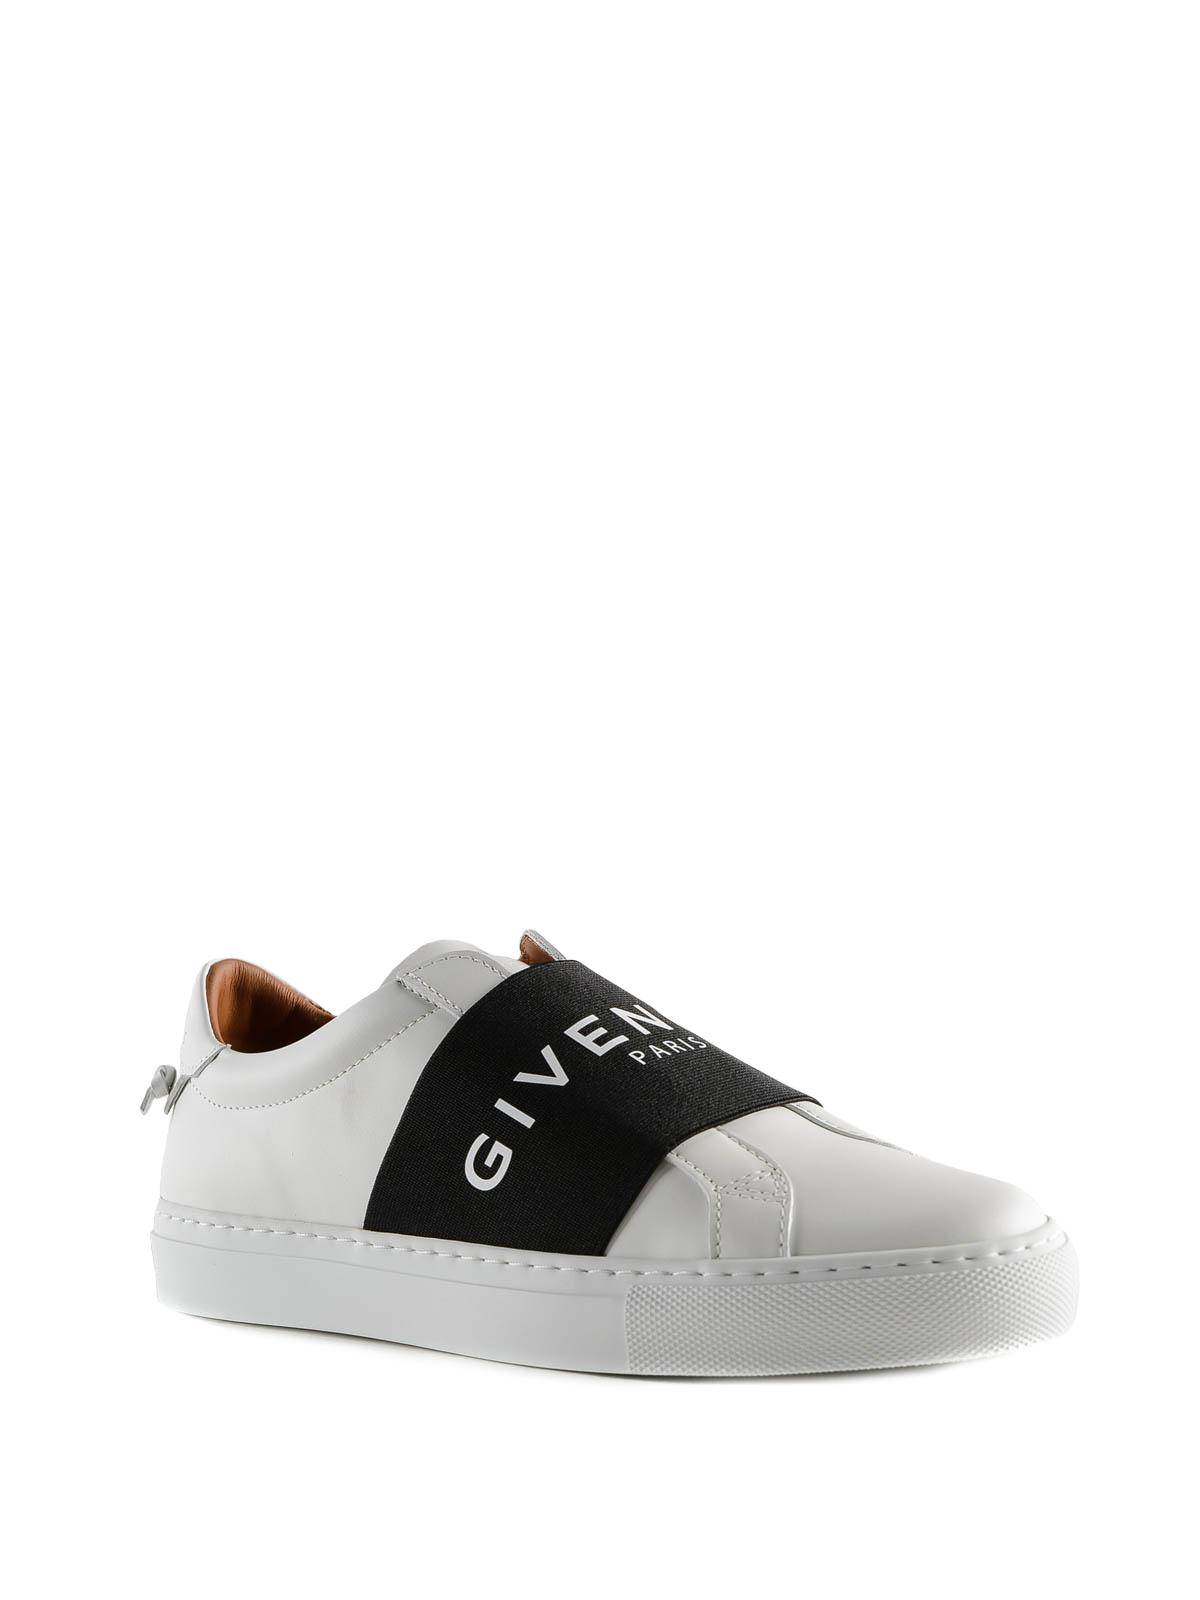 Sneaker Nera Sneakers Urban Givenchy Street Bianche Fascia Con wxAgZqd8 3e438d59204